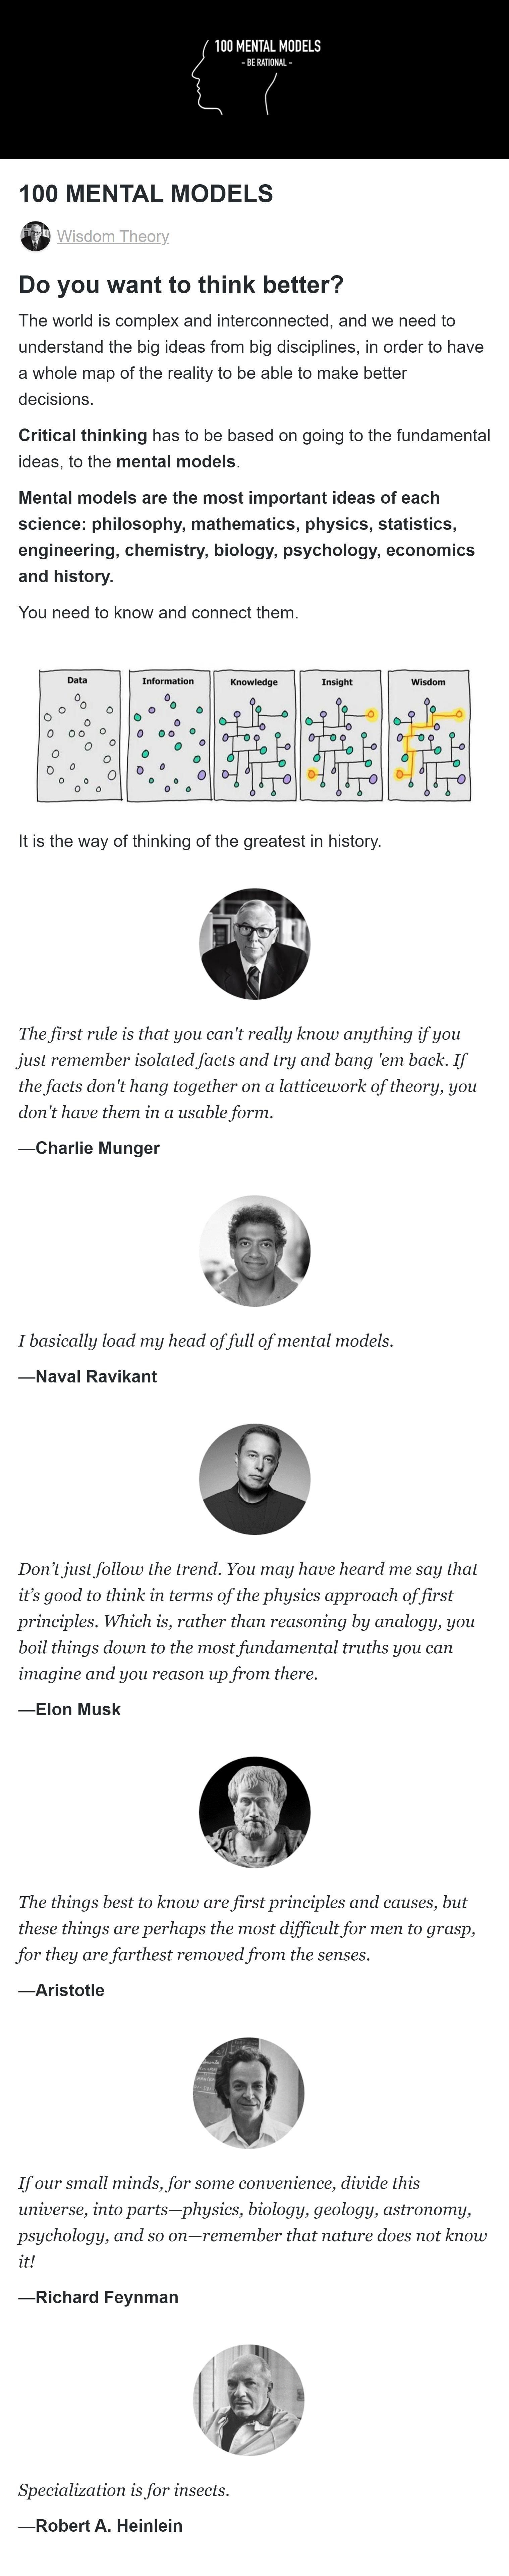 Wisdom Theory - 100 Mental Models